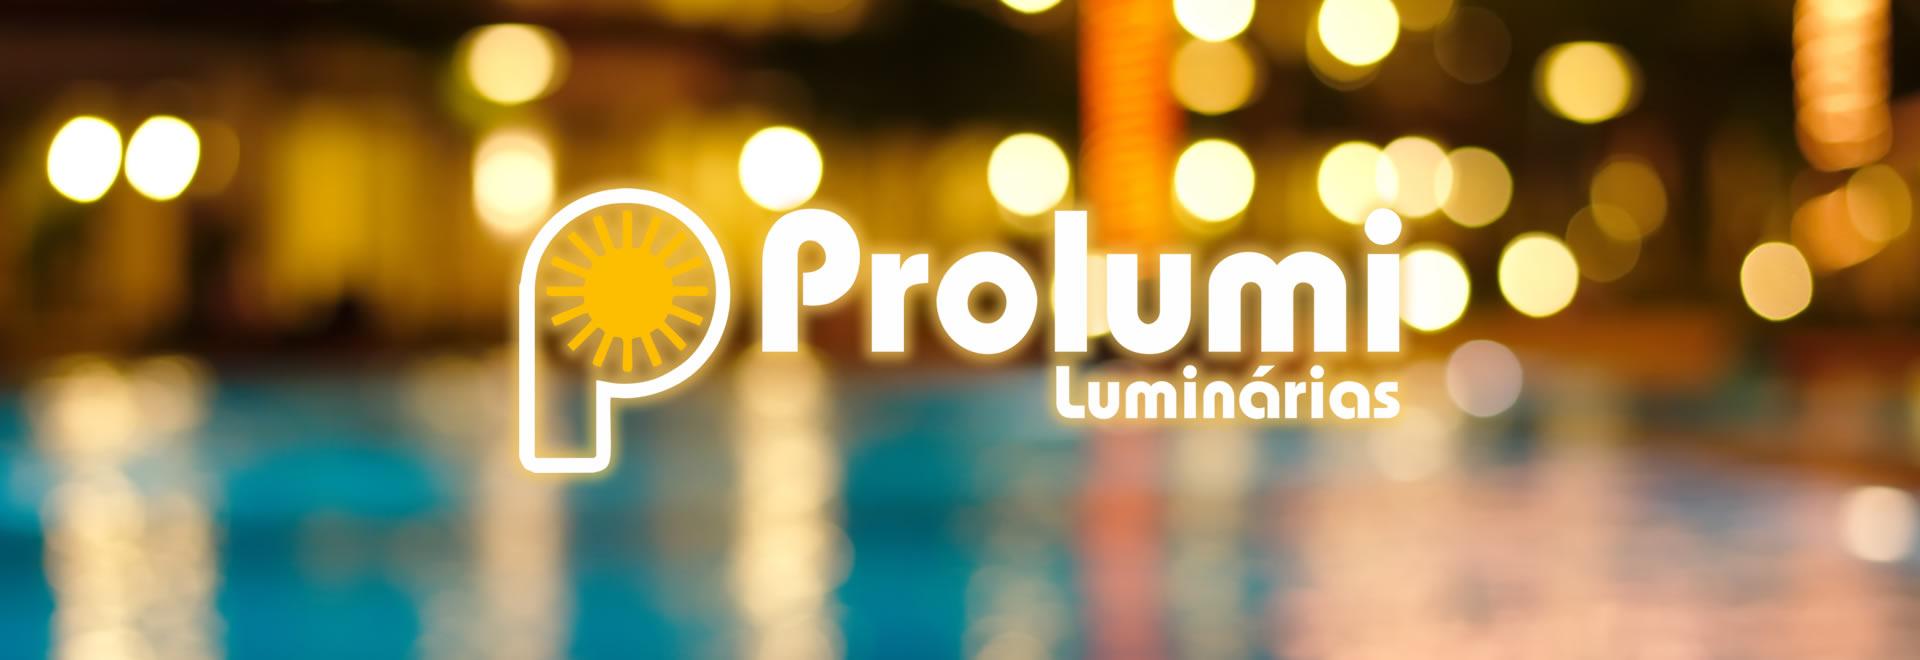 prolumi-luminaria